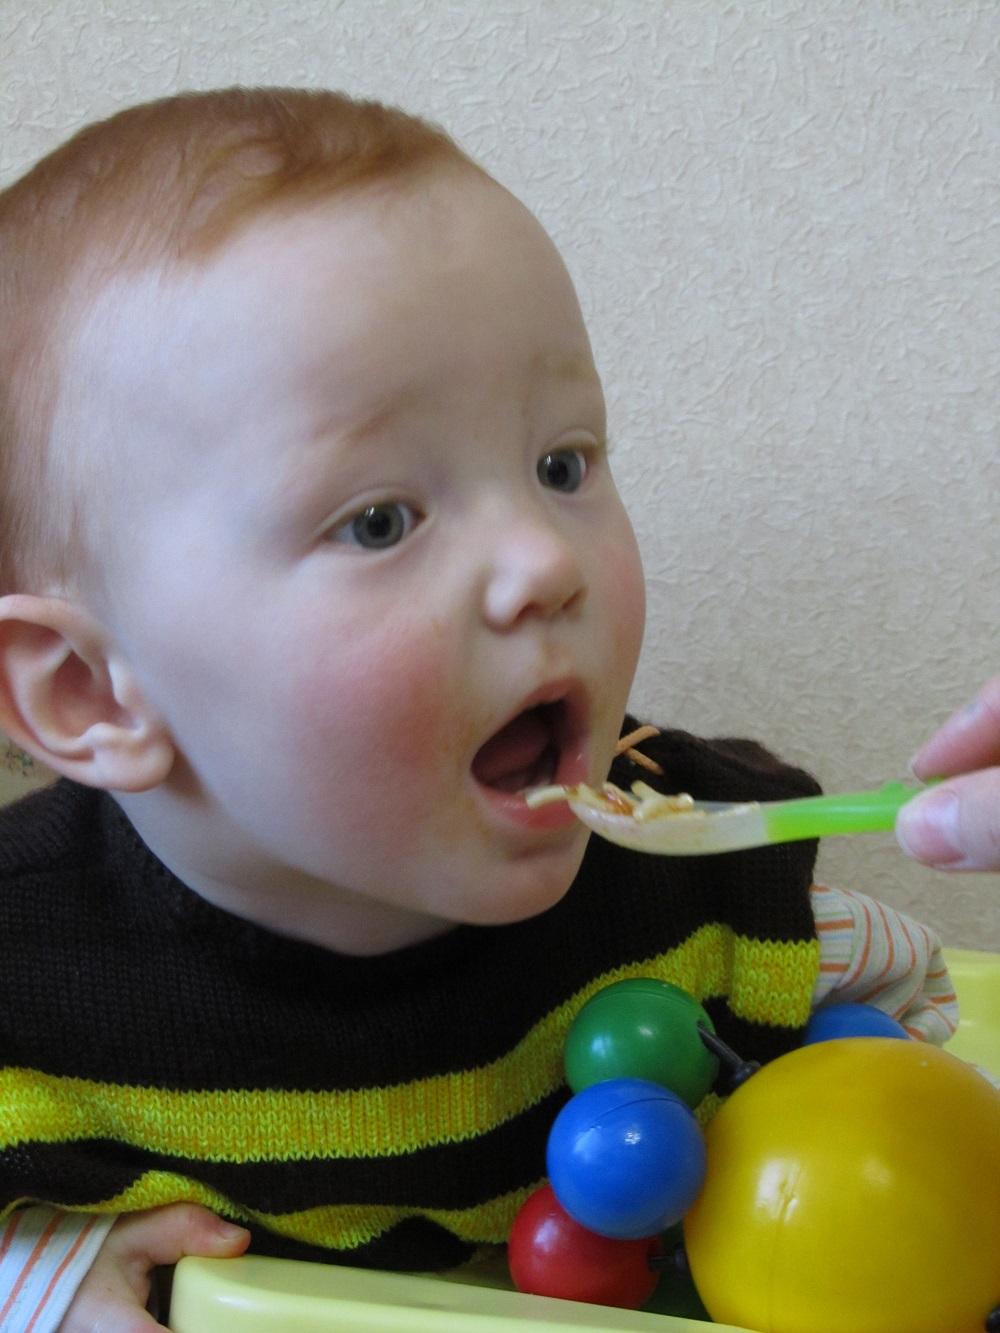 Я обед съедаю сам, открываю рот – и АМ!. Ложечку за маму, ложечку за папу...